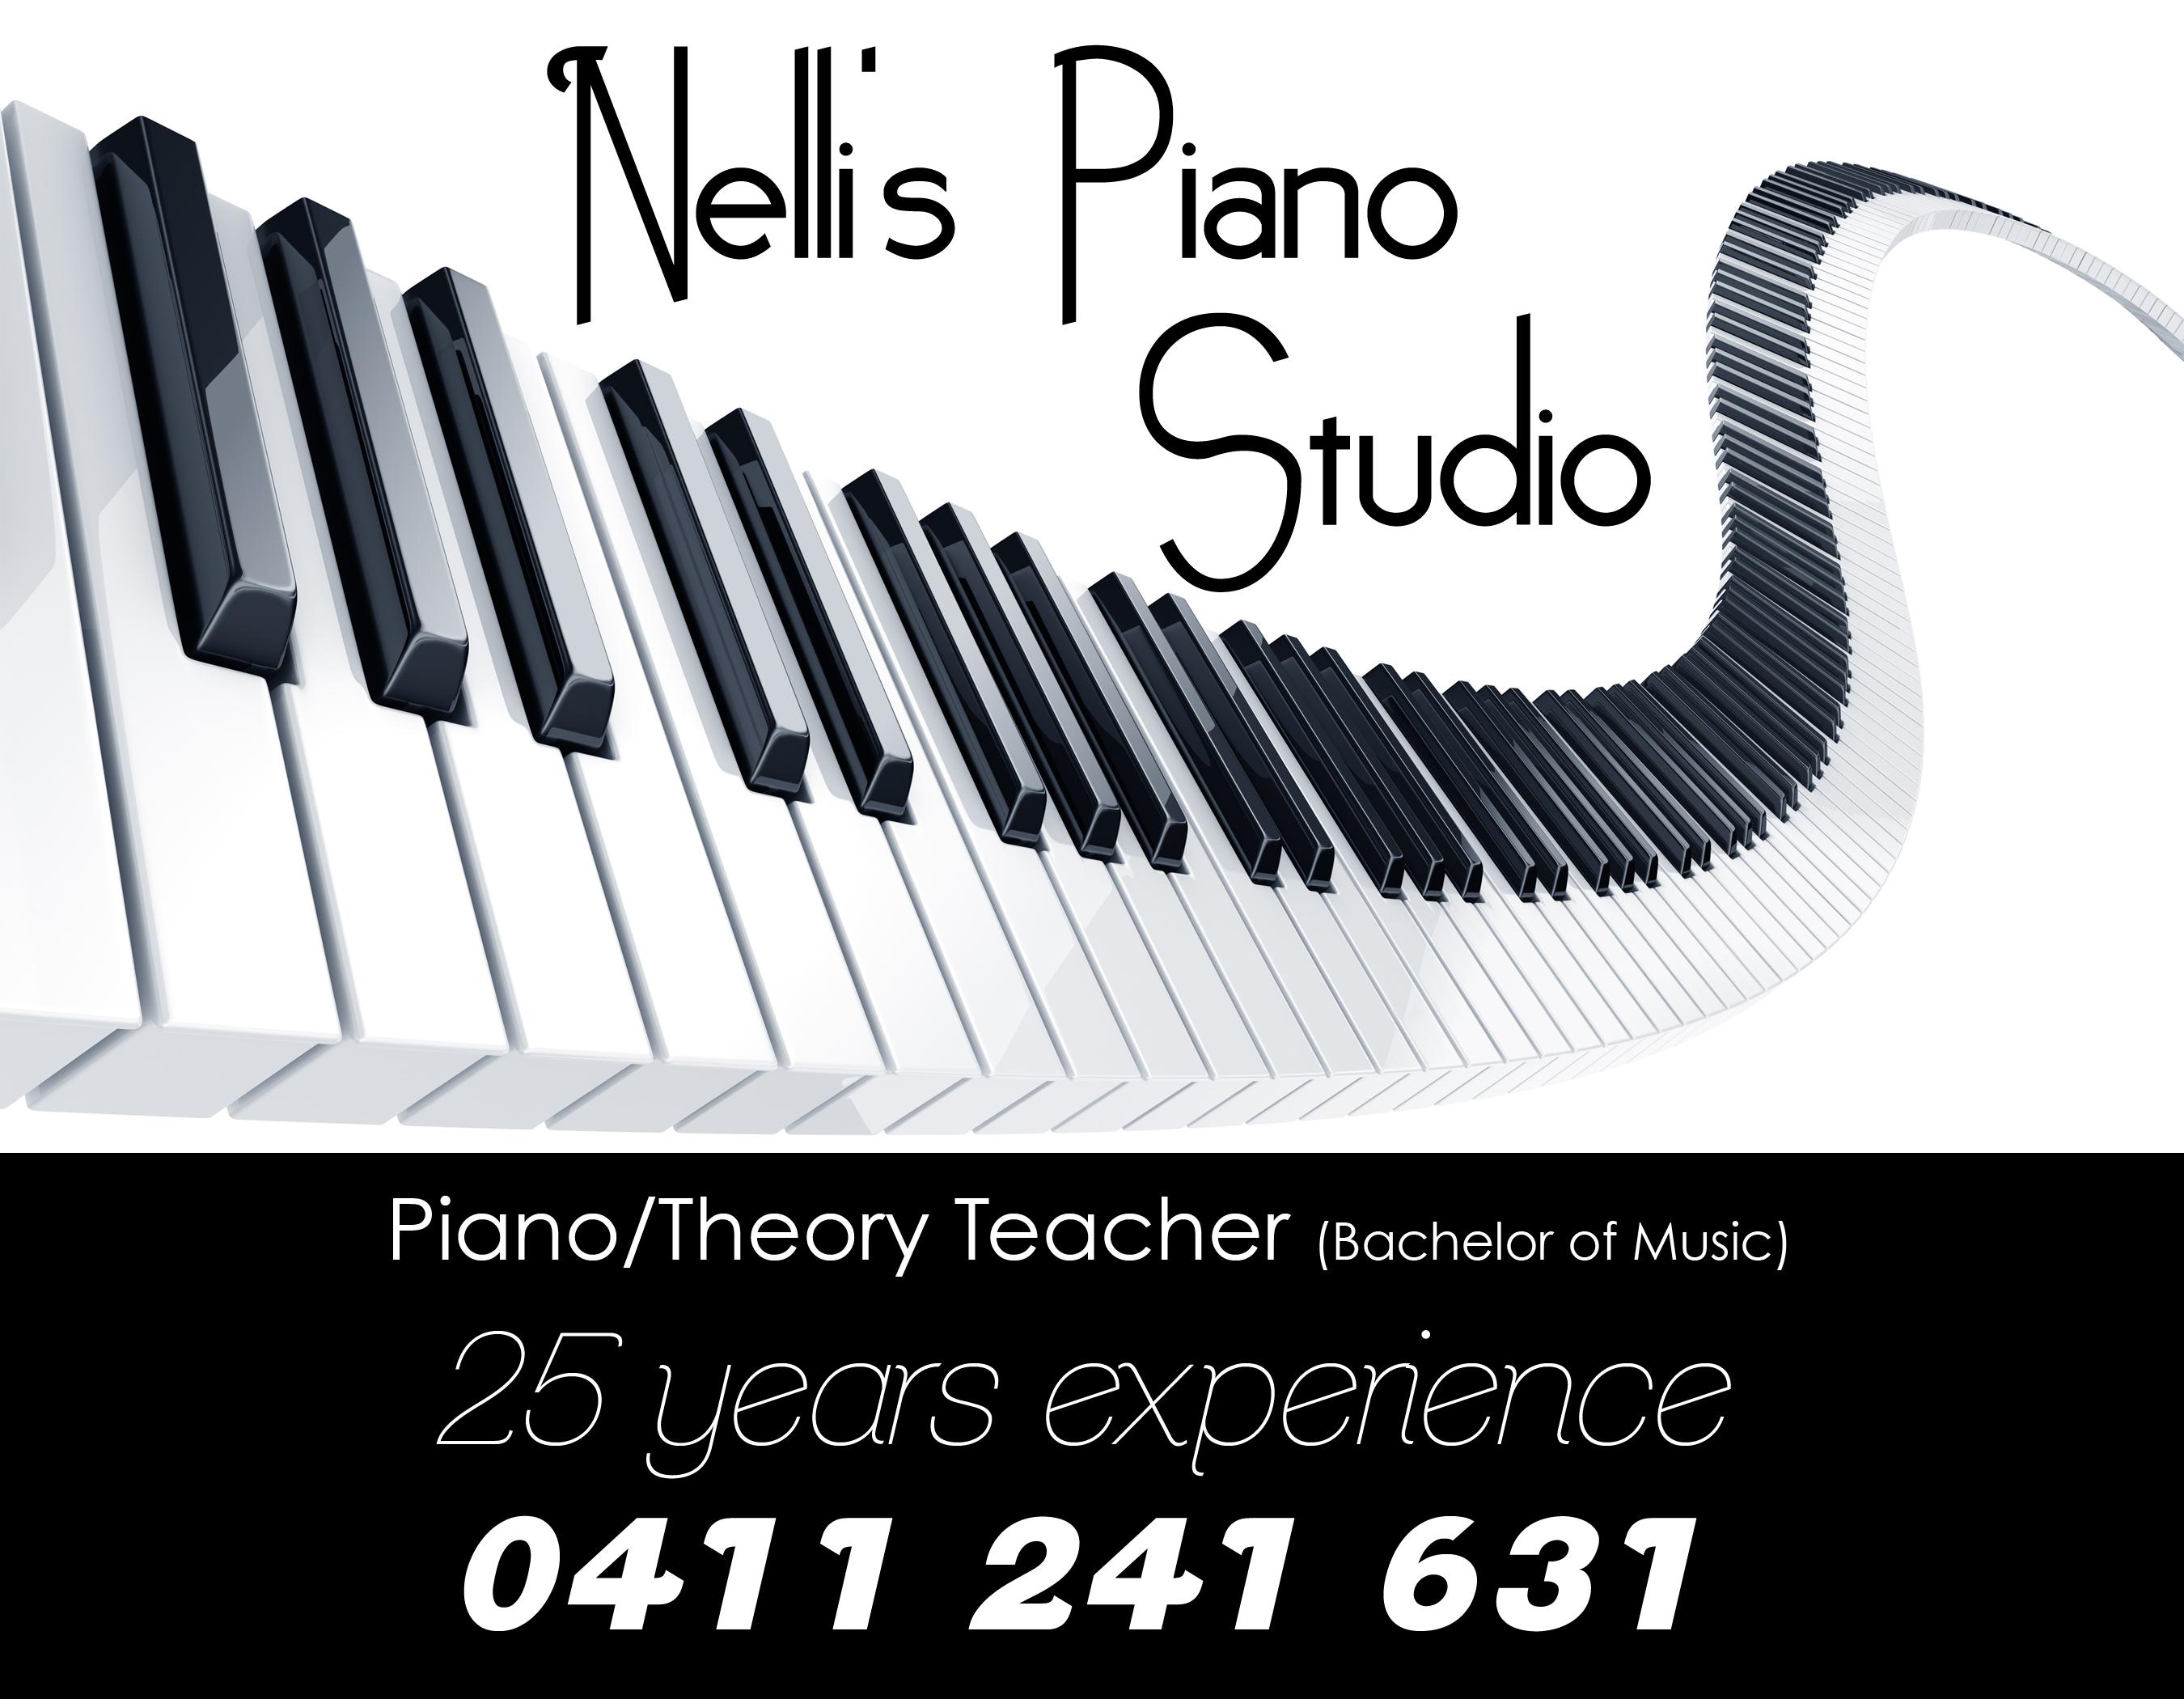 Nellis Piano Studio - Piano teacher Caulfield South | 4 Sheridan Grove, CAULFIELD SOUTH, Victoria 3162 | +61 411 241 631